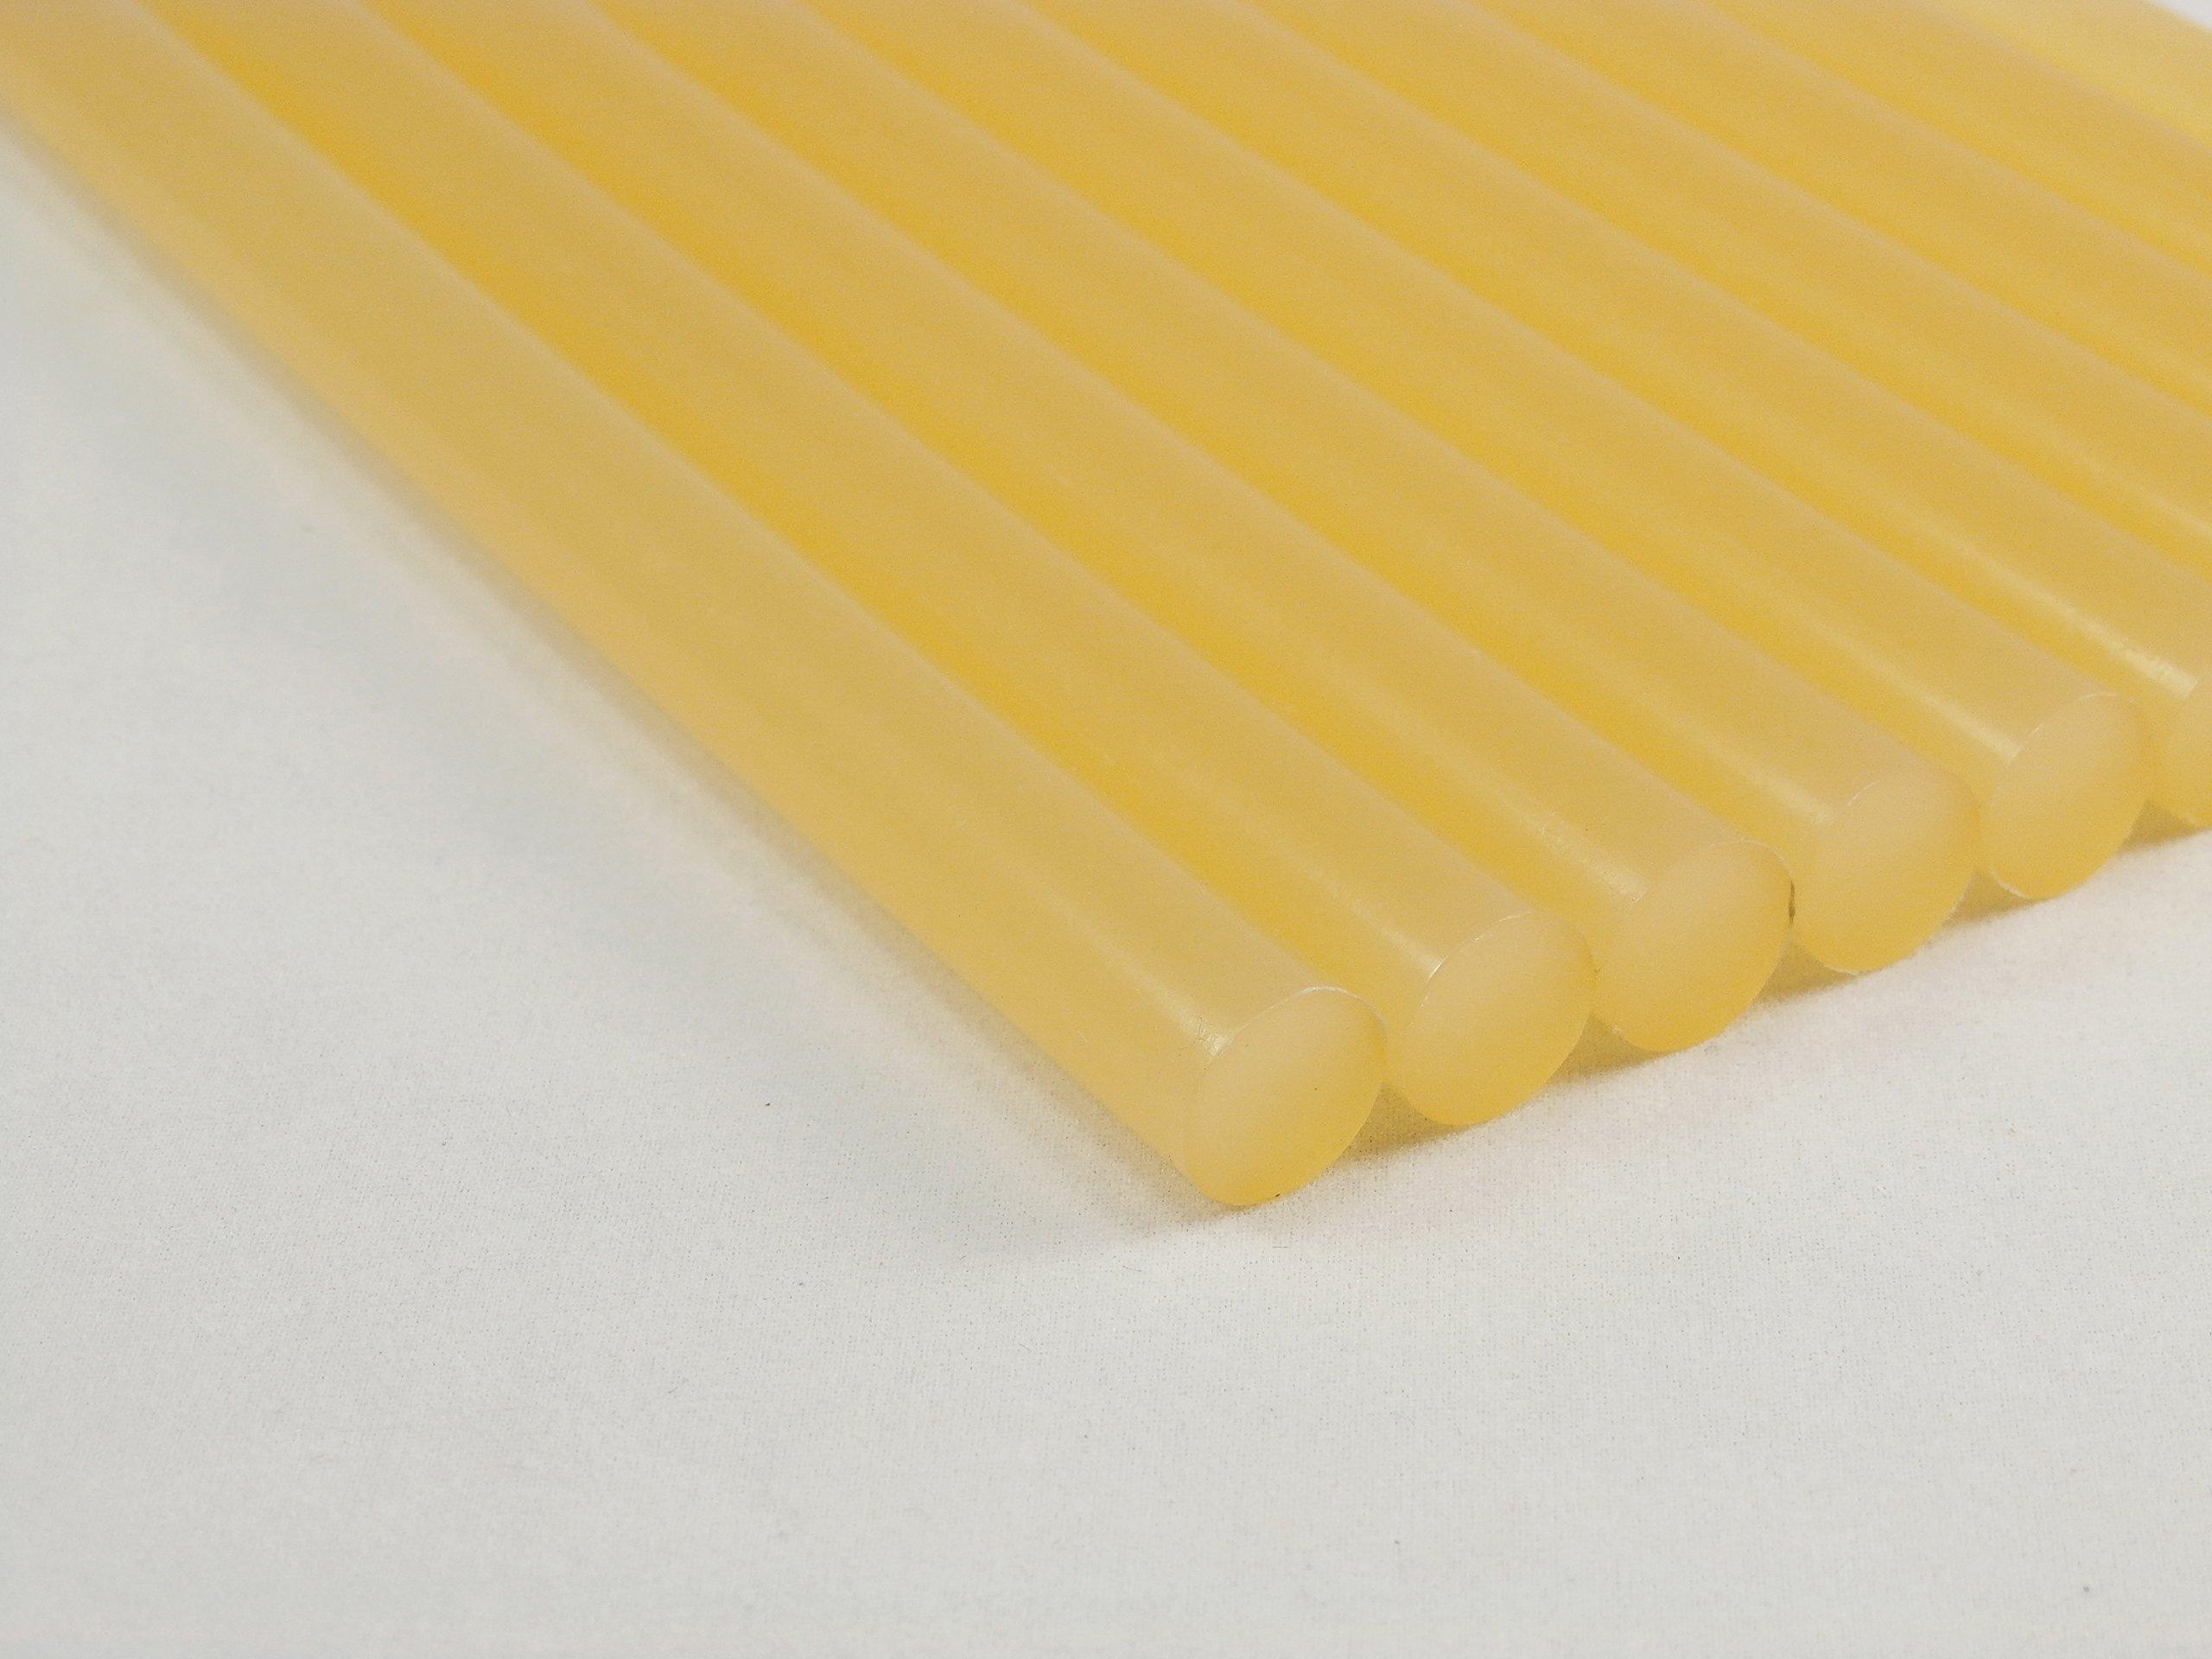 GlueSticksDirect PDR Glue Sticks Amber 7/16'' X 10'' 12.5 lbs Bulk PDR by GlueSticksDirect.com (Image #6)